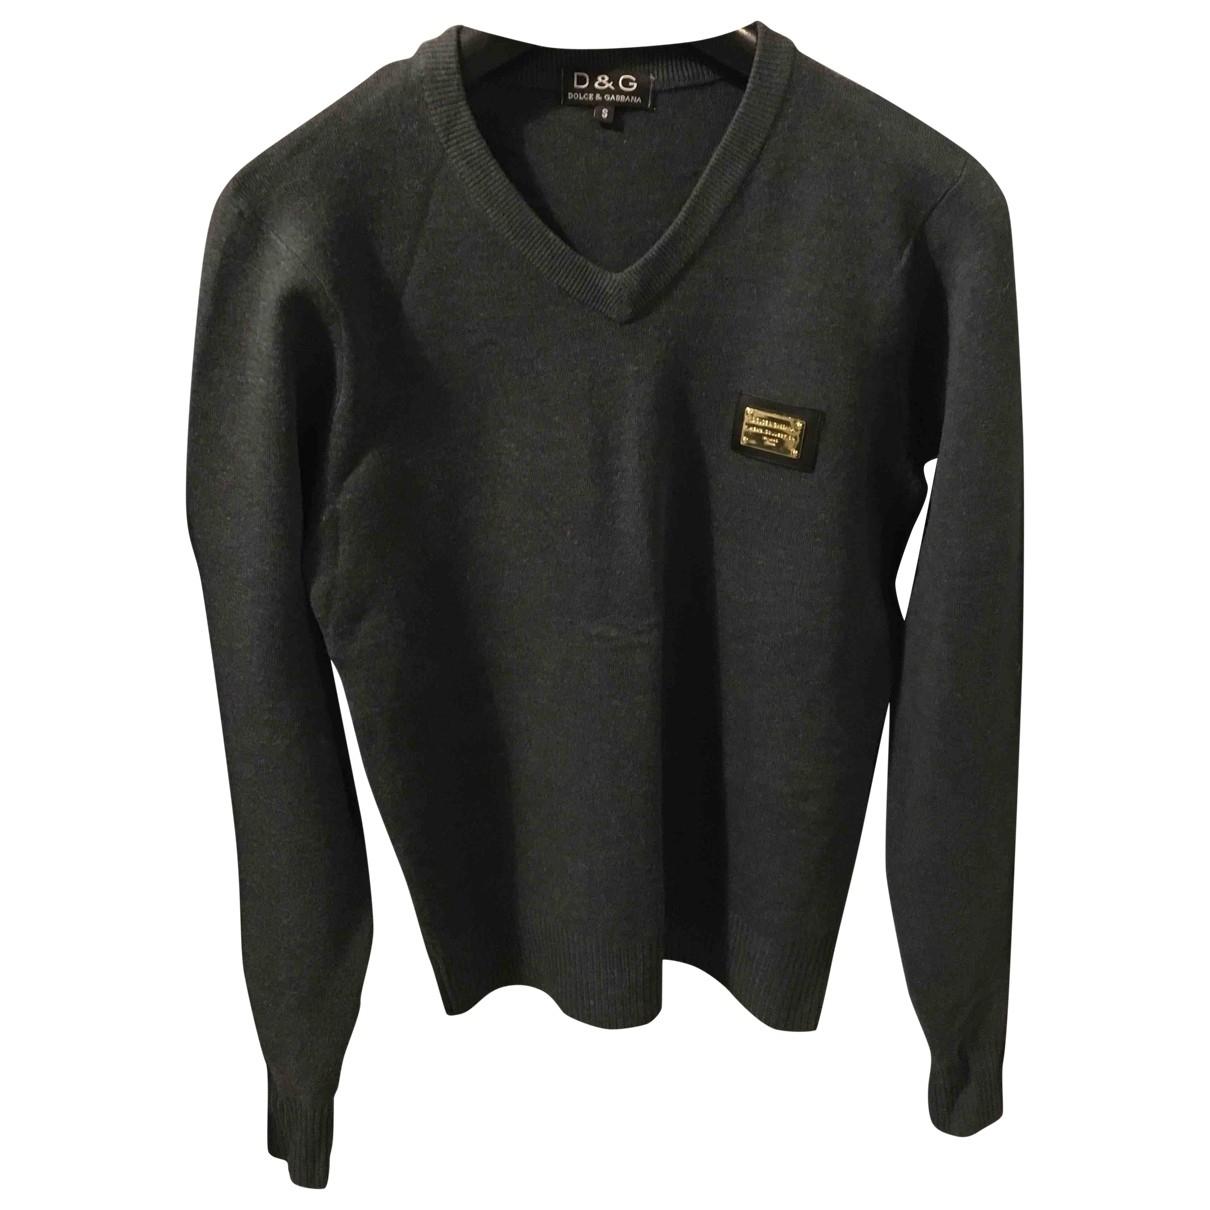 D&g \N Grey Cashmere Knitwear & Sweatshirts for Men S International